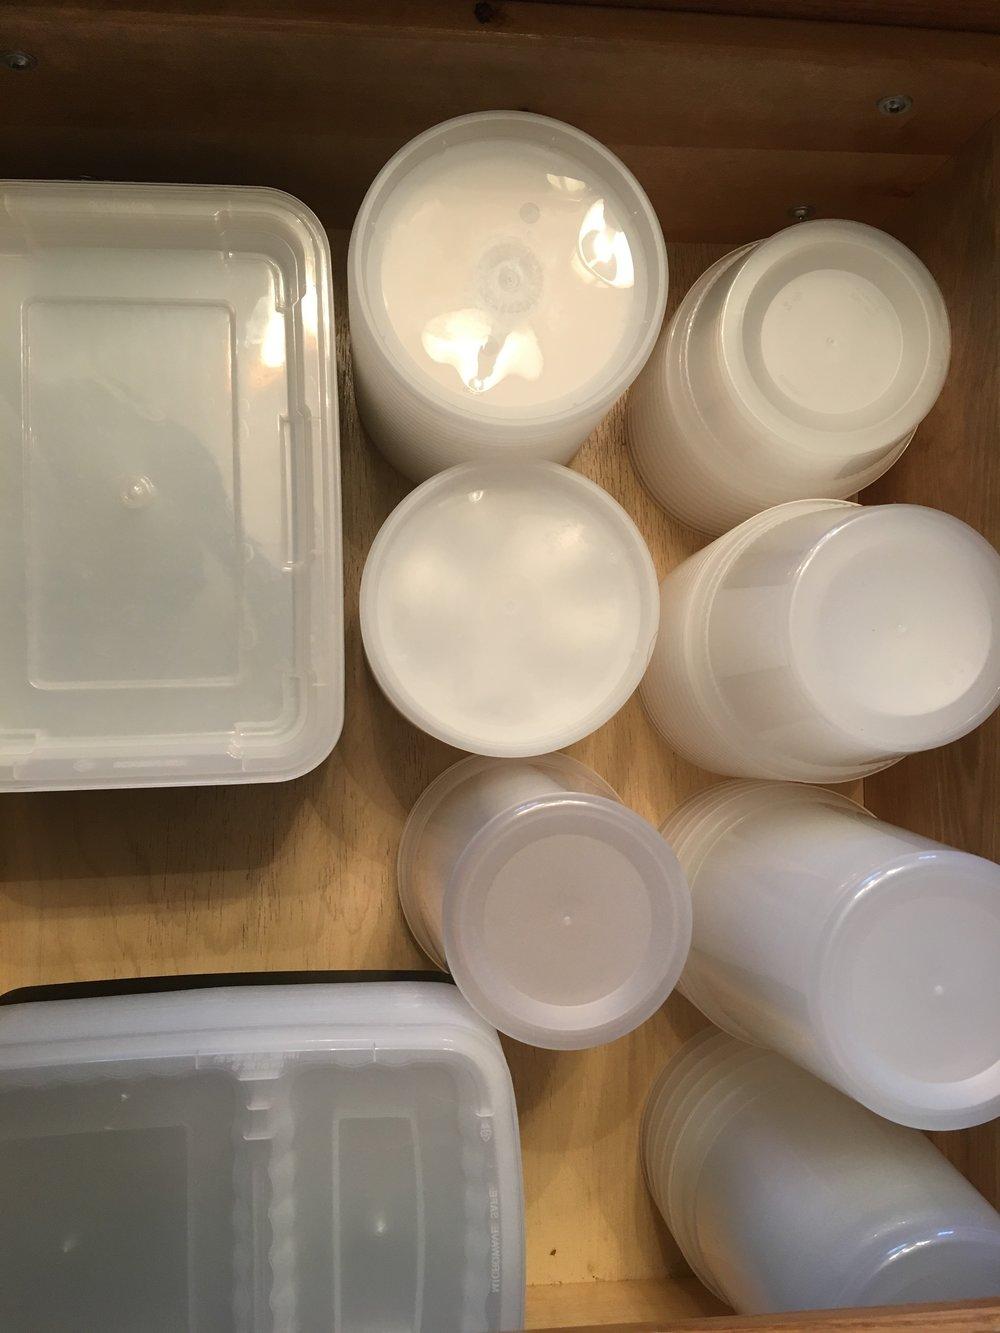 Deli Containers  /  Bento Box Containers